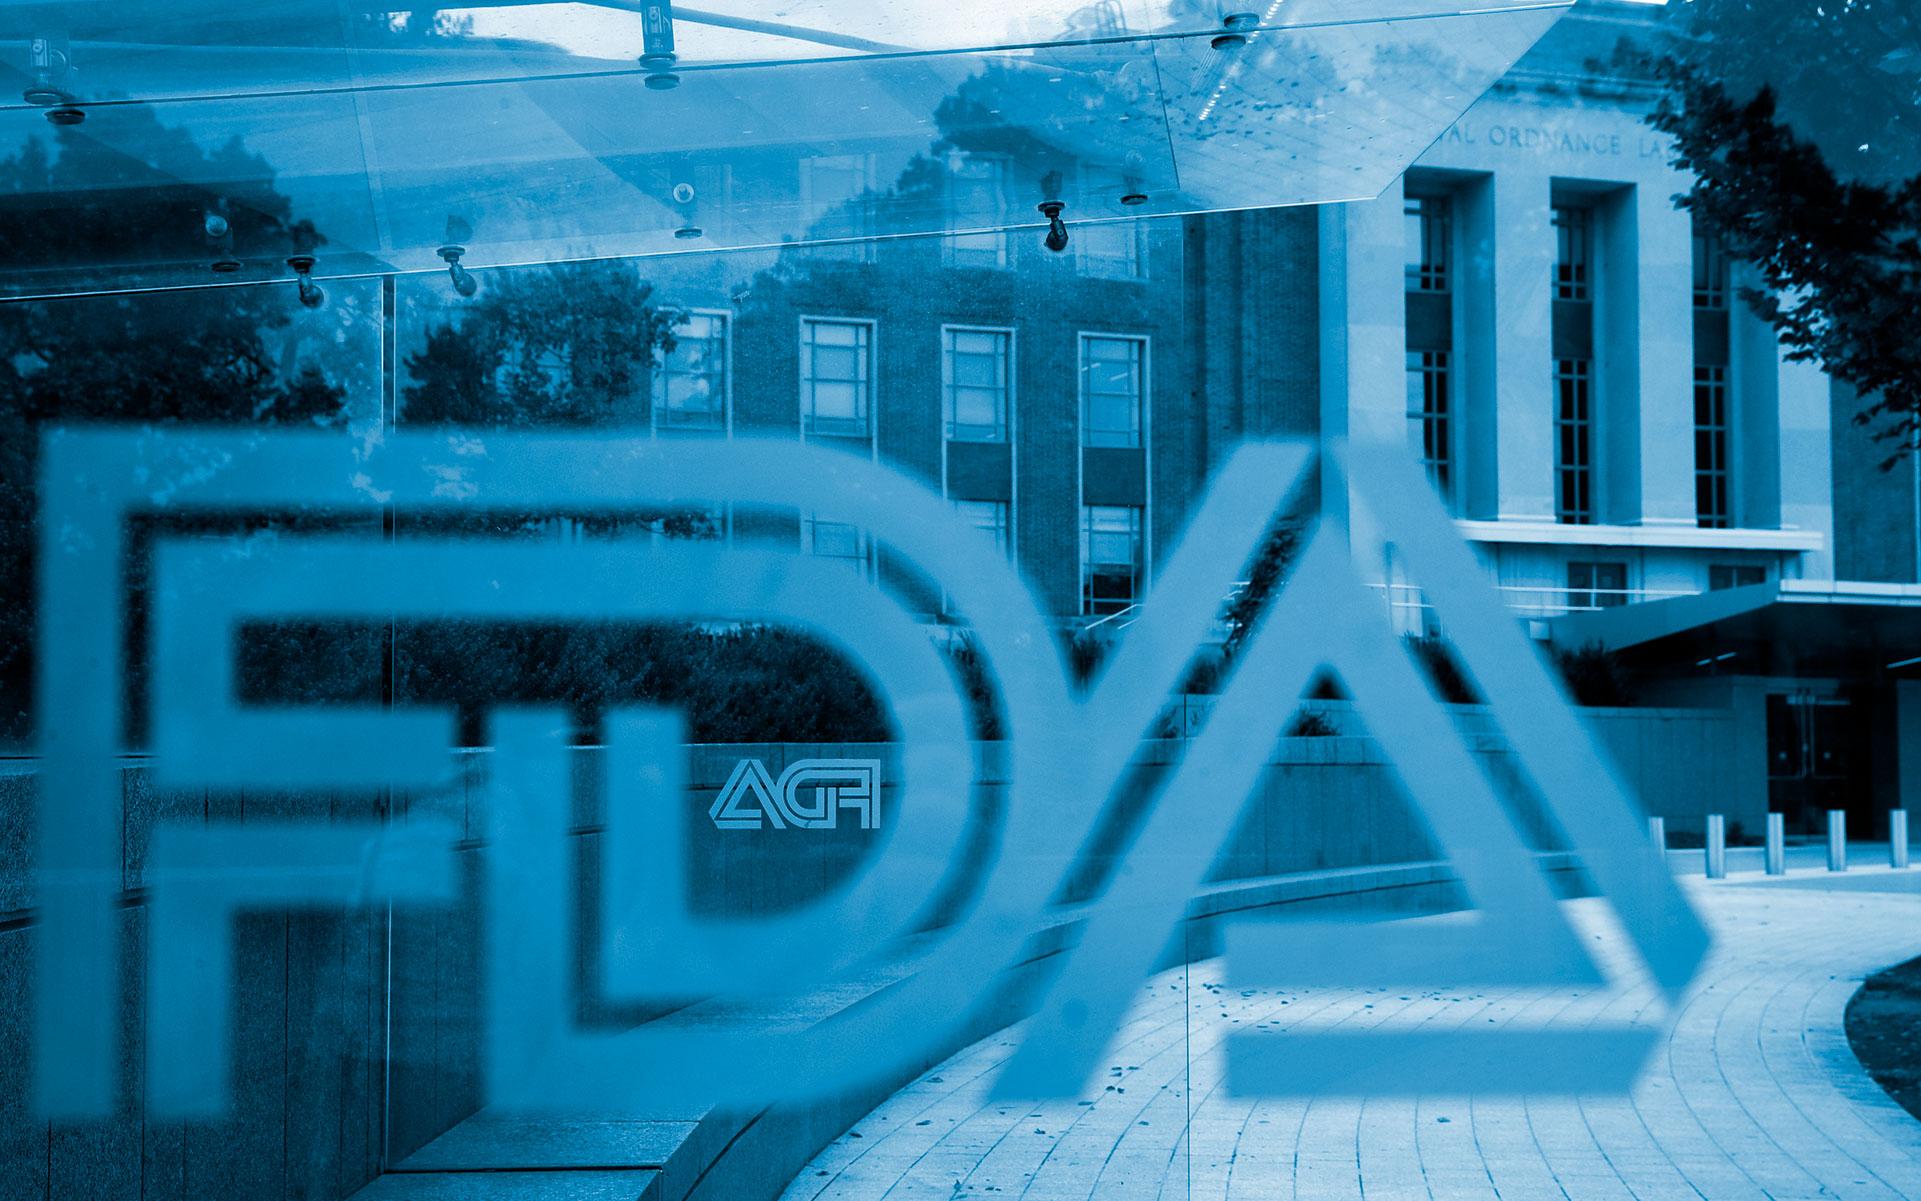 Senators Ask FDA to Update Rules on CBD Products thumbnail